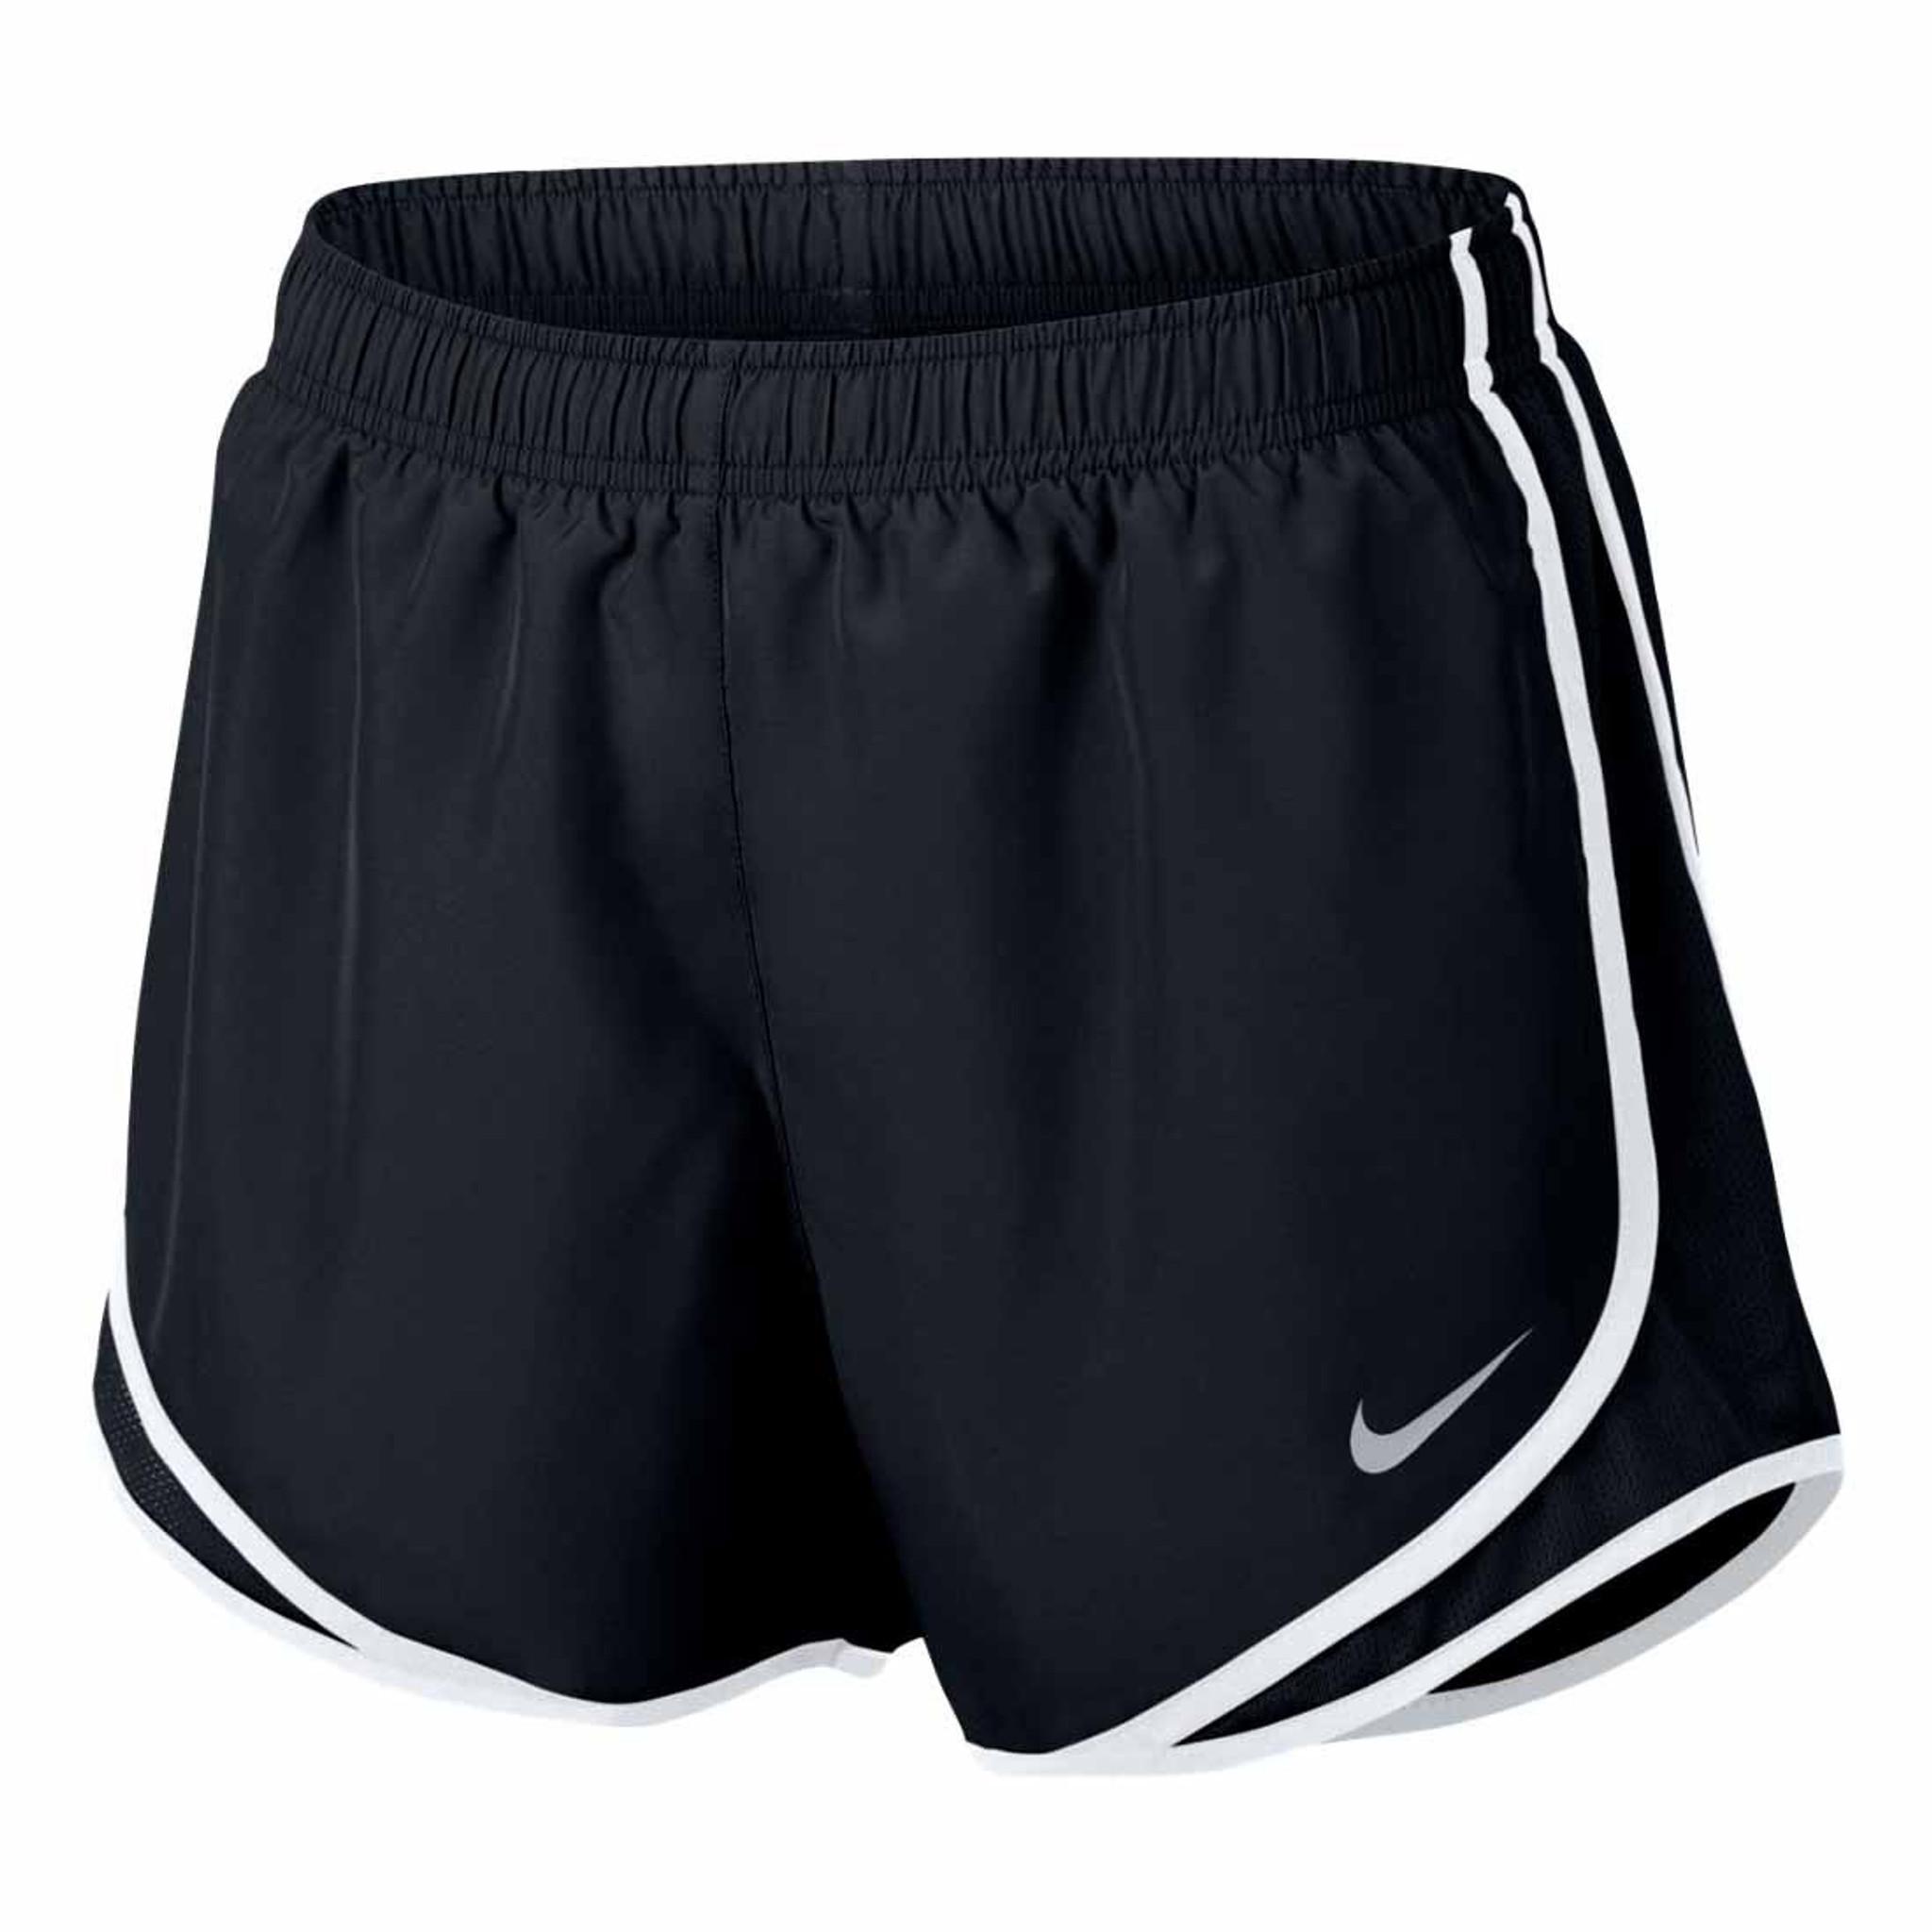 b3aca46c8a20 Women s Black White Nike Tempo Running Shorts - TYLER S